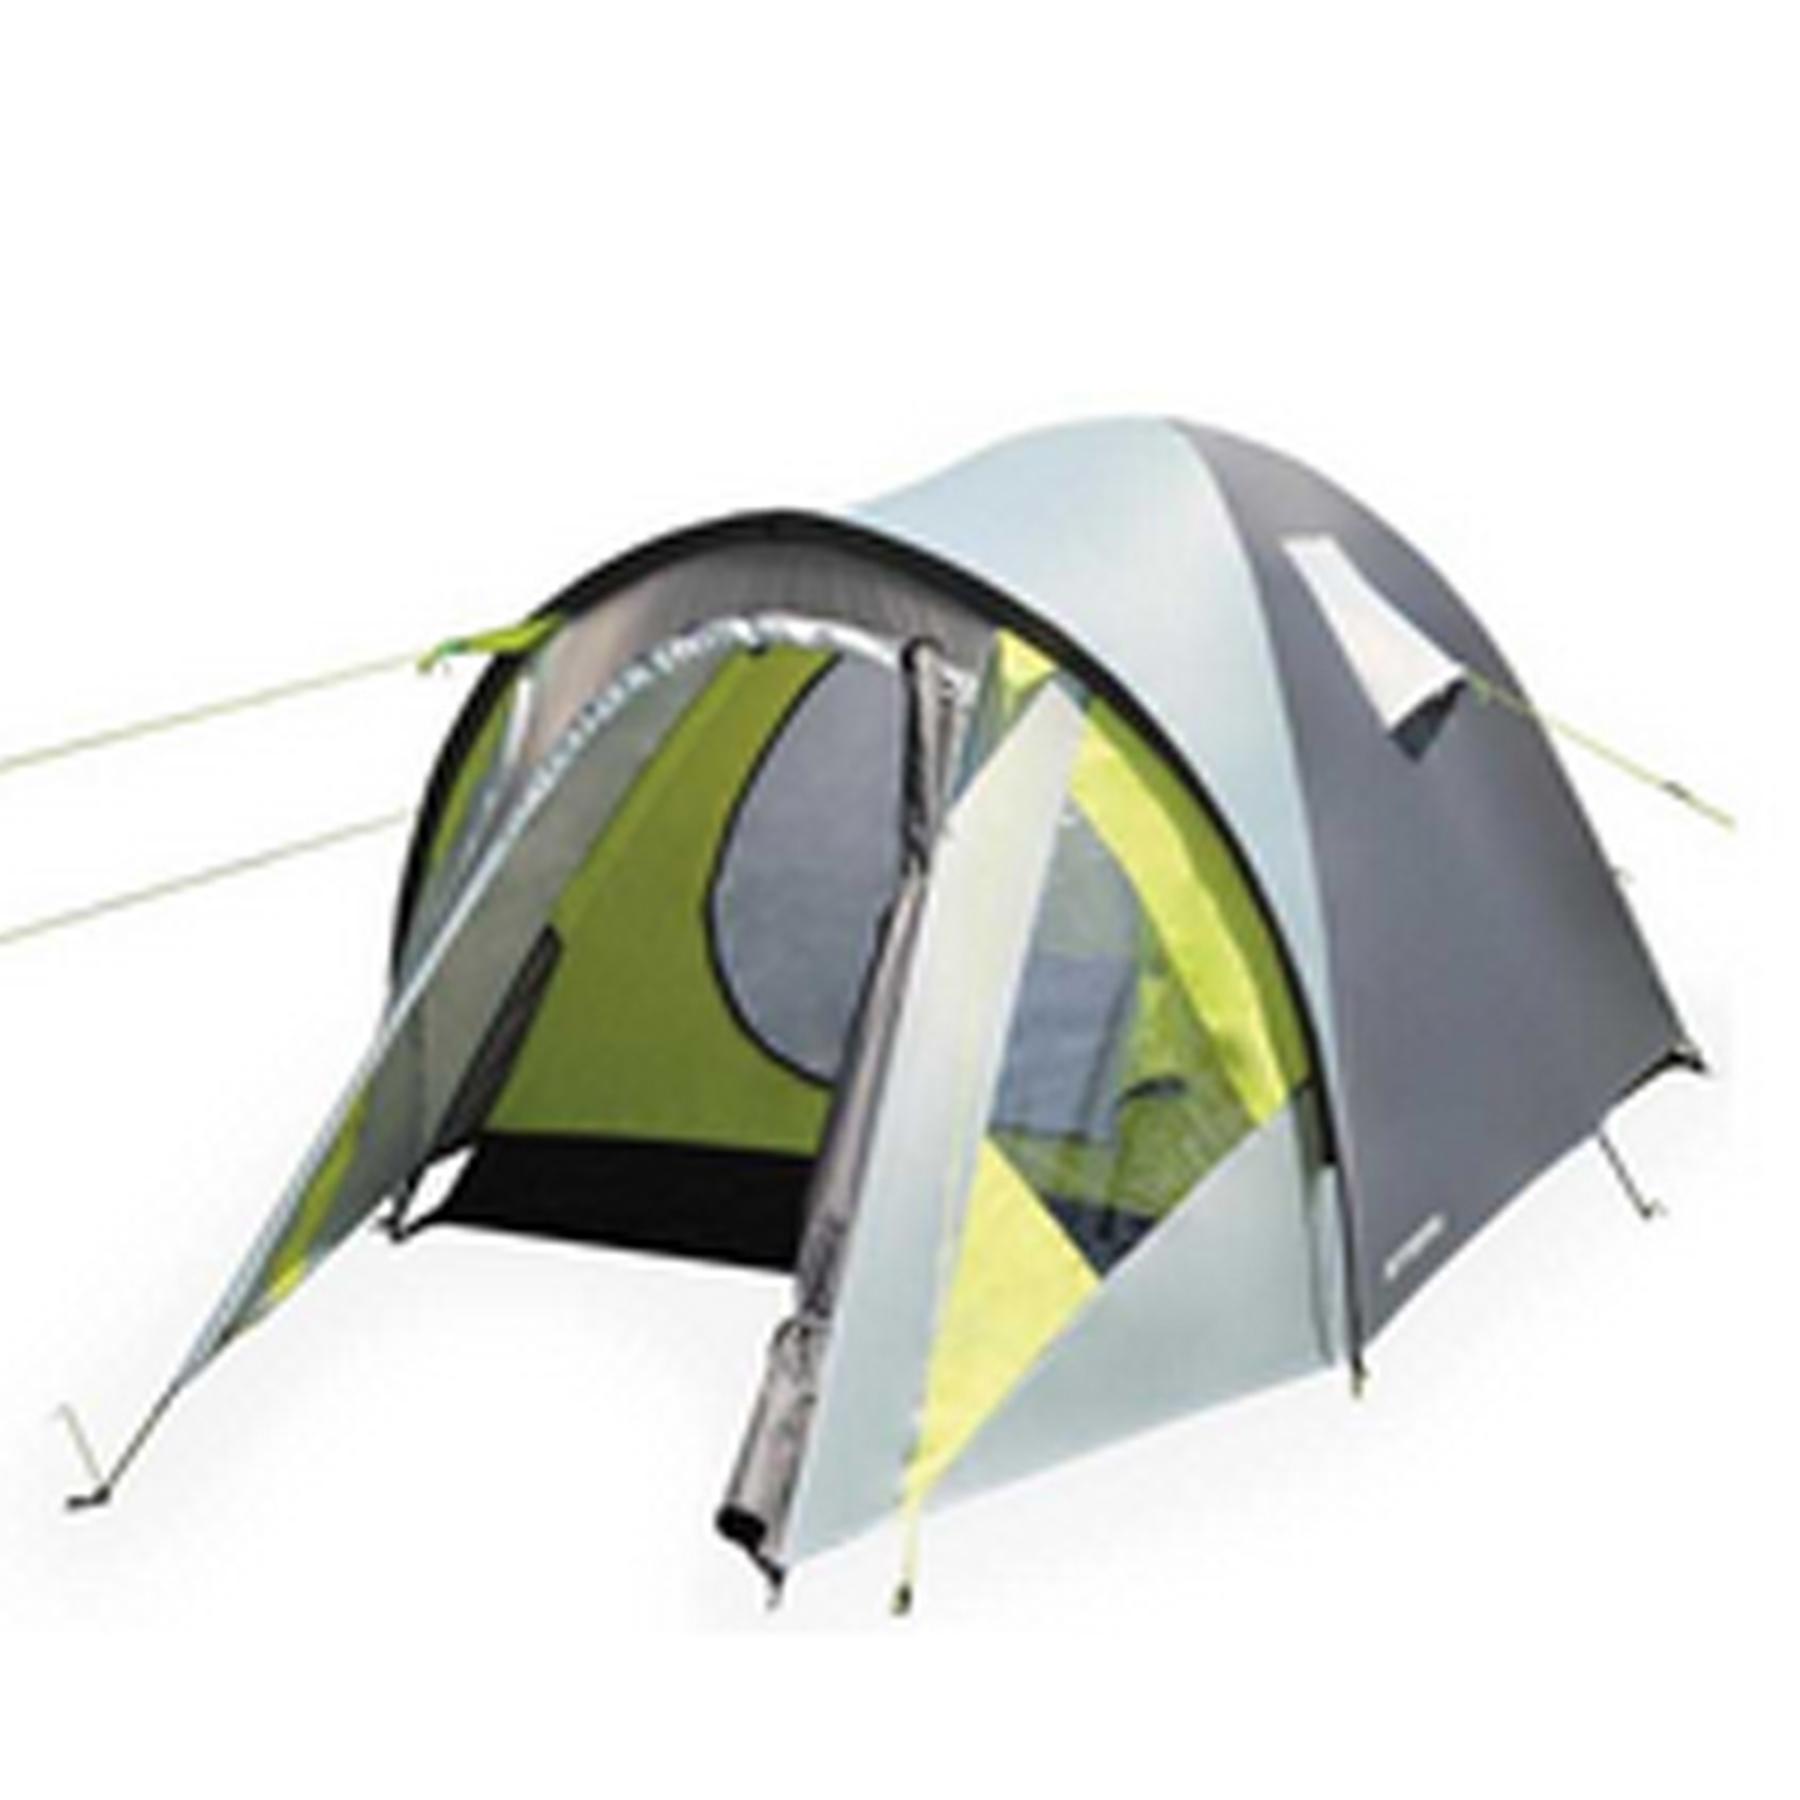 Палатка АТ Angara 2 (3,7 кг, водост.3000 мм, 280*140см h-120см)